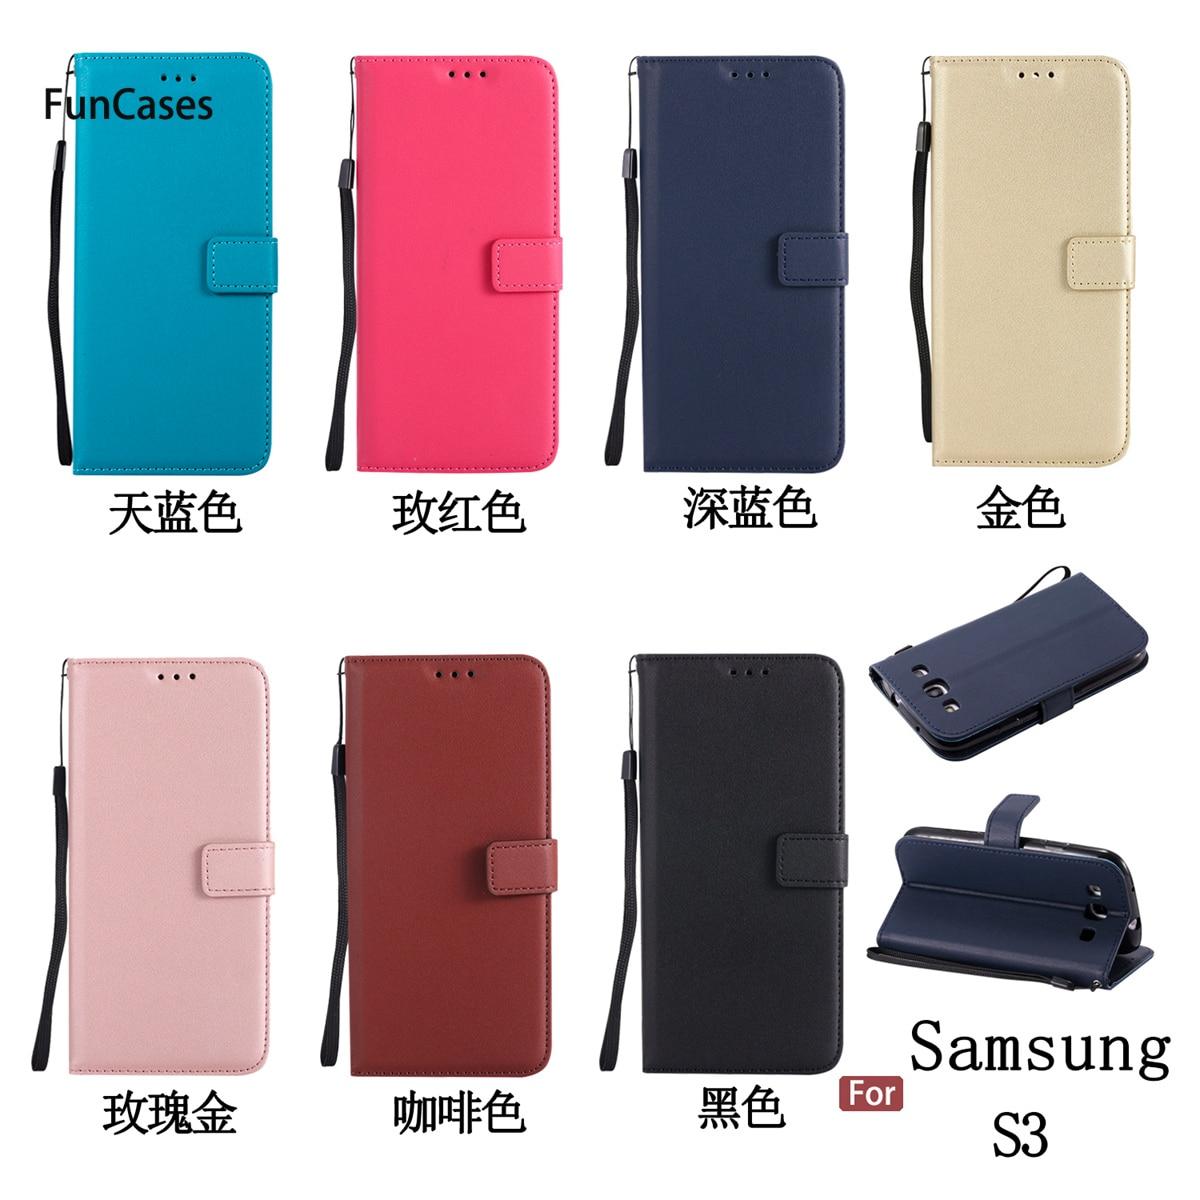 Wallet Phone Case sFor Etui Samsung S3 Card slot Case Carcasa Wallet Phone Case Samsung Galaxy S3 Neo i9300 i9305 SIII